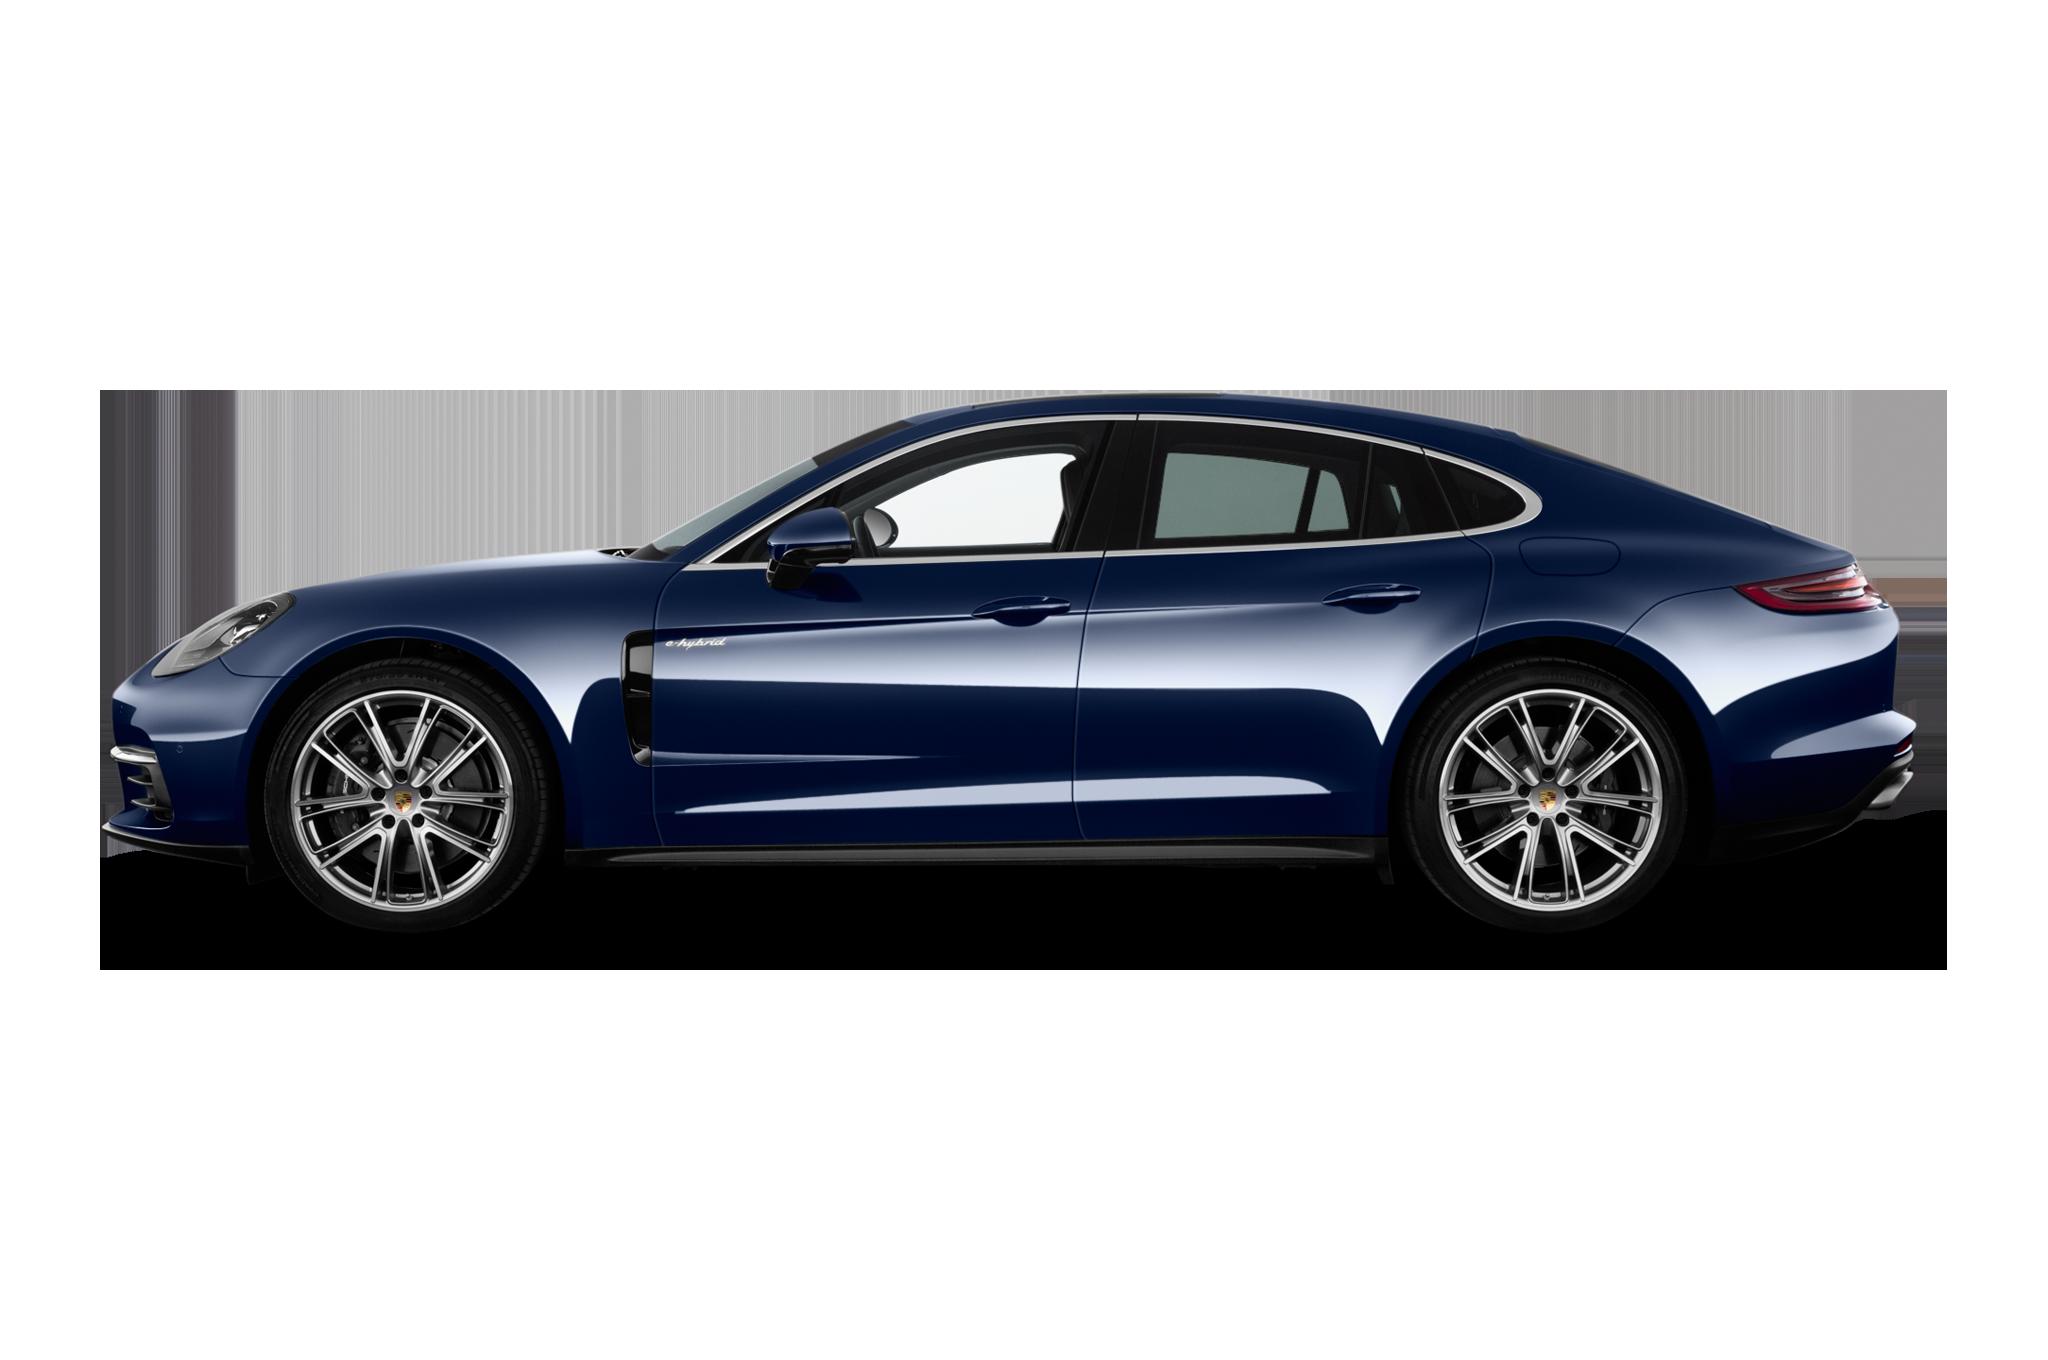 2018 porsche panamera sport turismo first drive review automobile magazine - Porsche panamera 5 portes ...